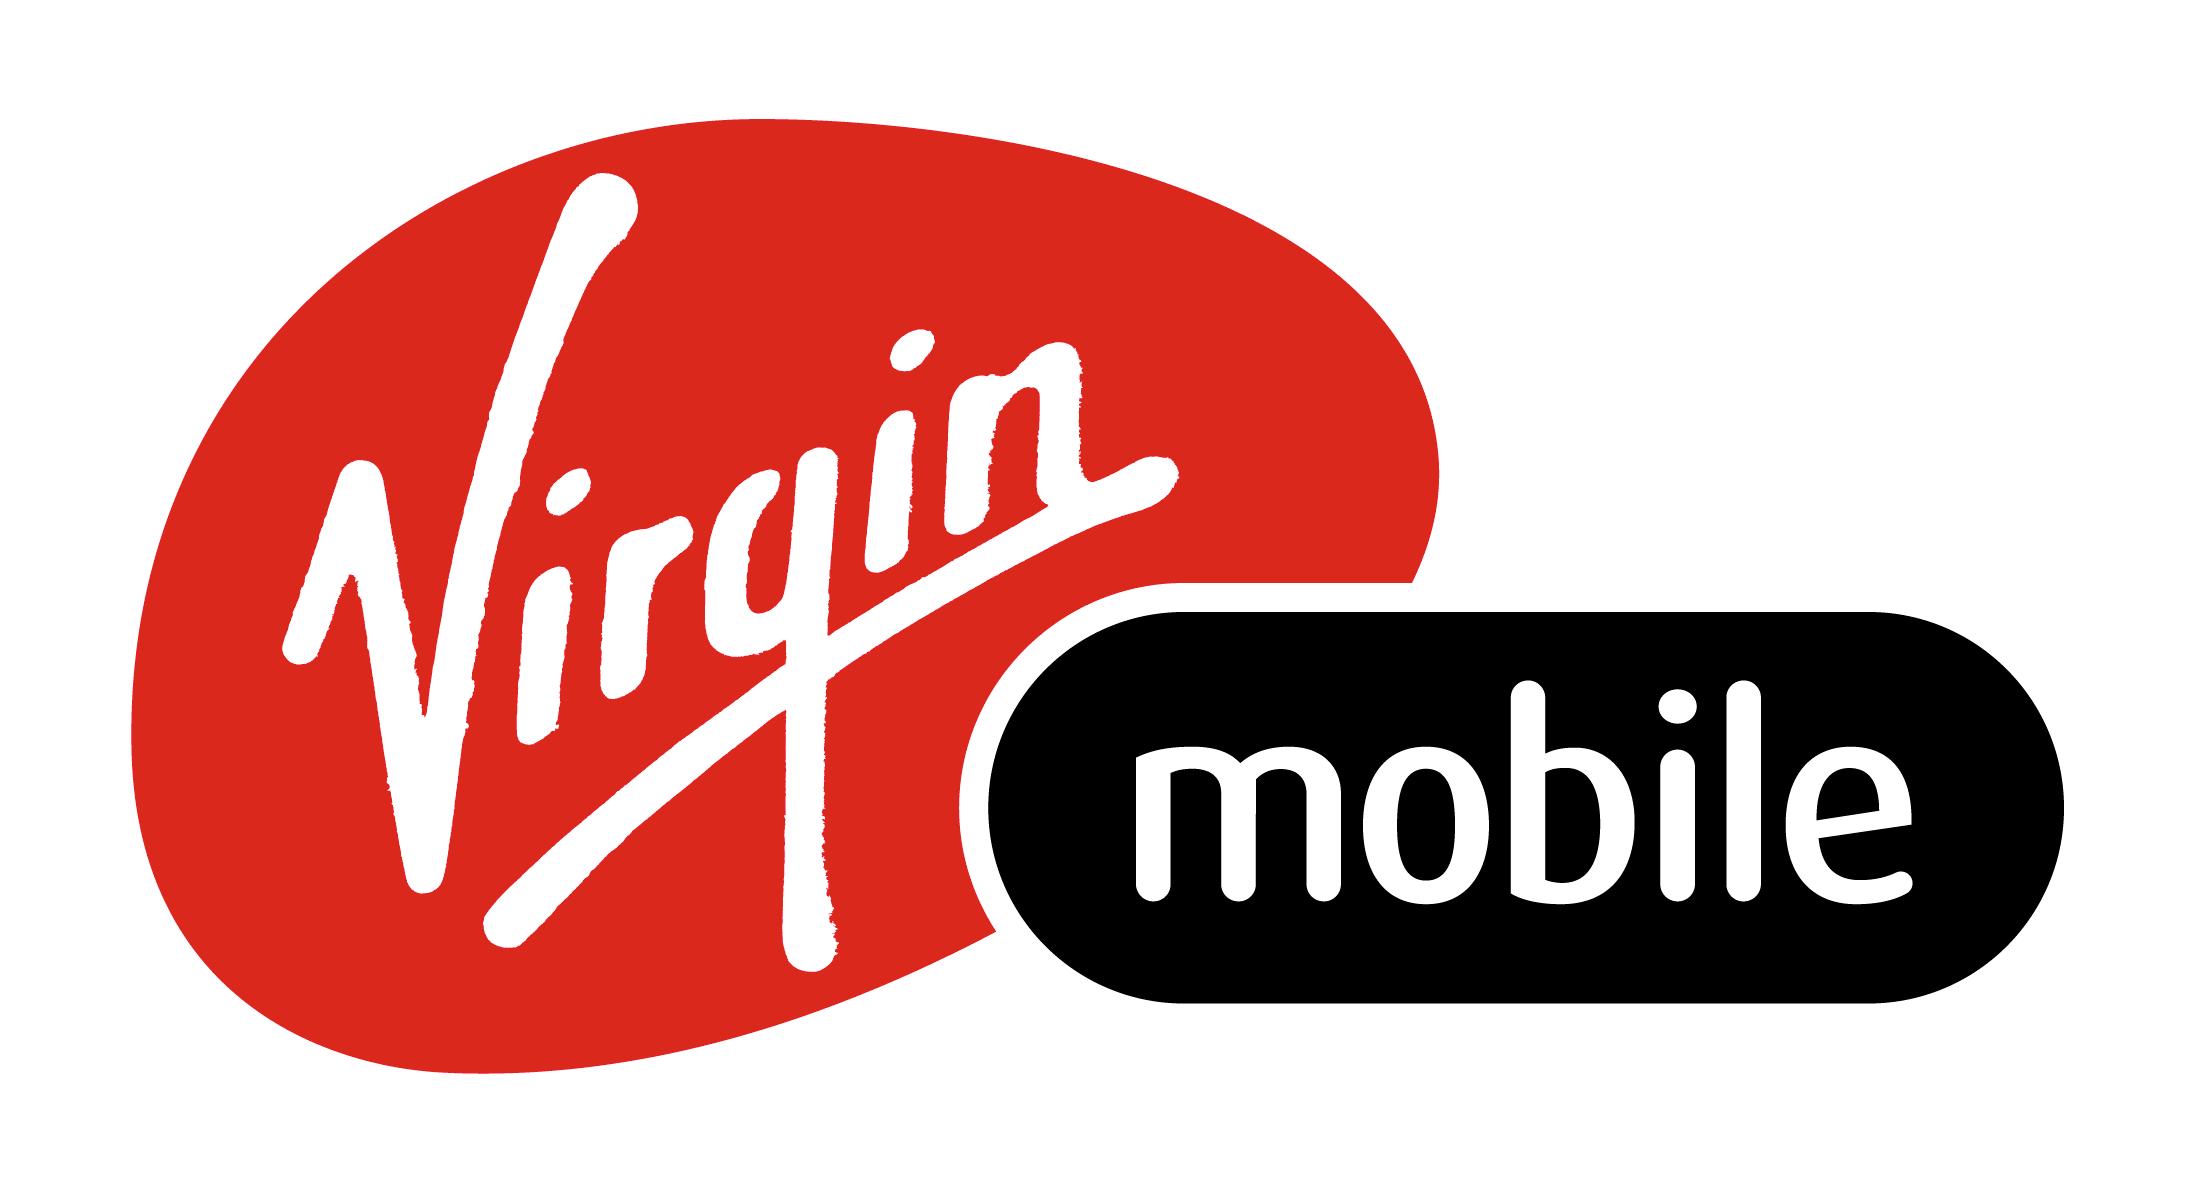 virginmobile_logo